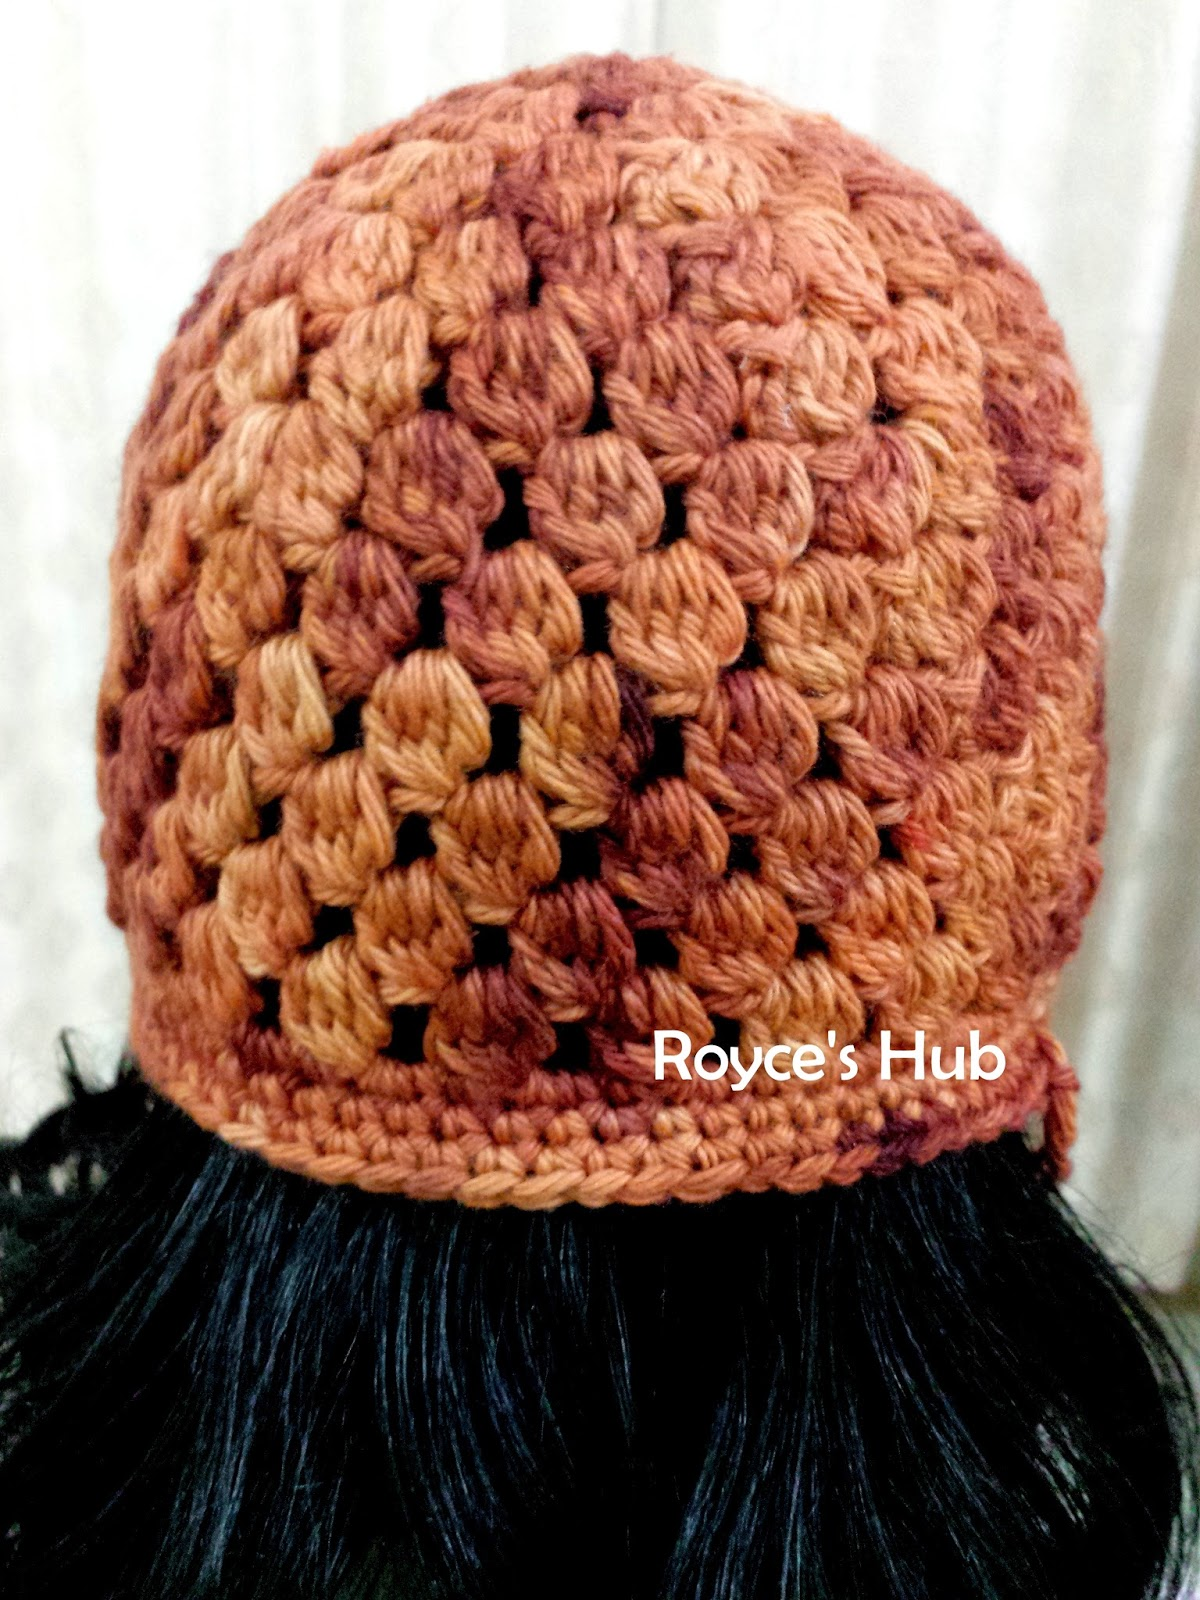 Royce\'s Hub: The Raining Acorns Crochet Beanie with Pattern